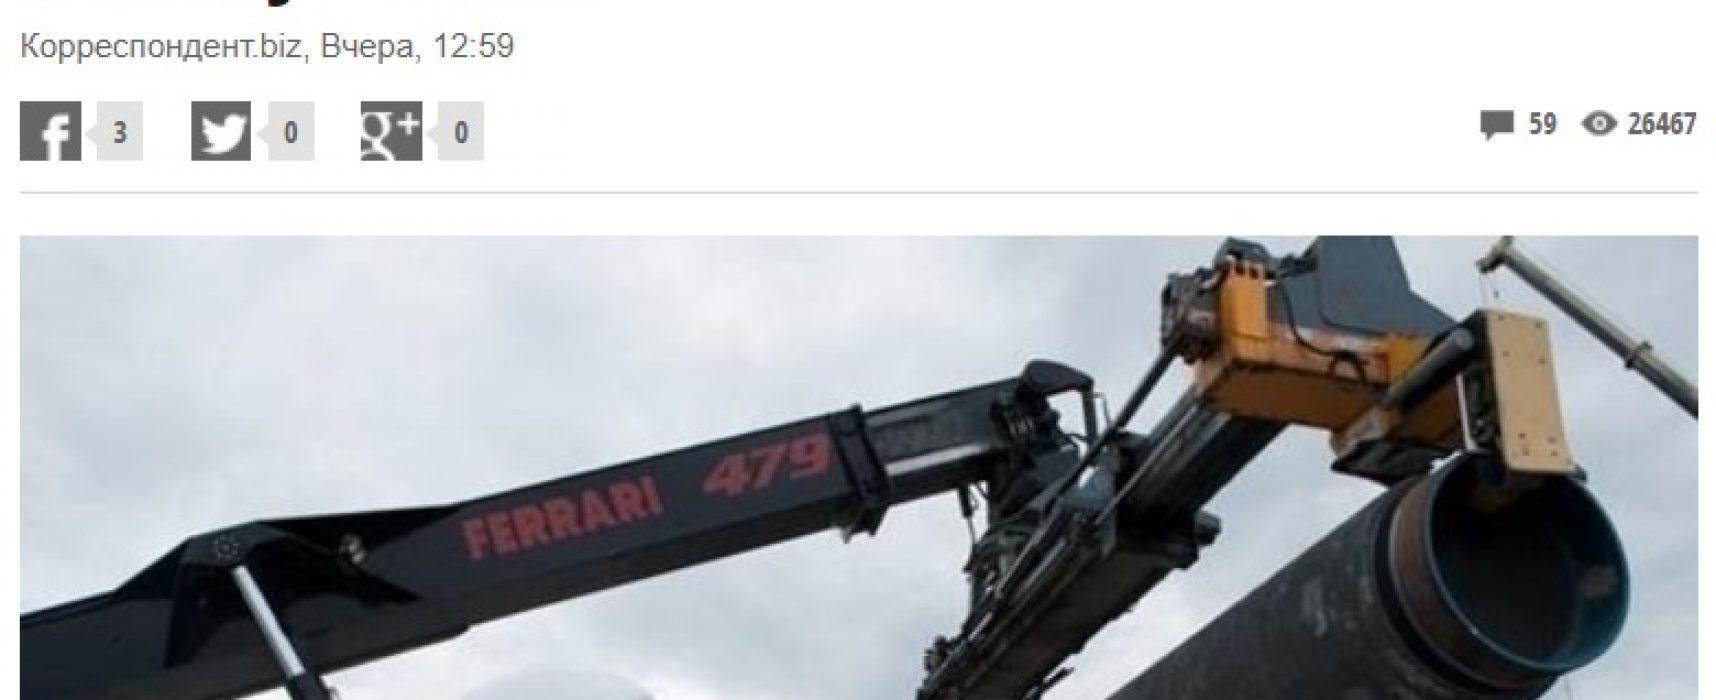 Фейк: «Нафтогаз» проиграл суд против «Газпрома» в ЕС